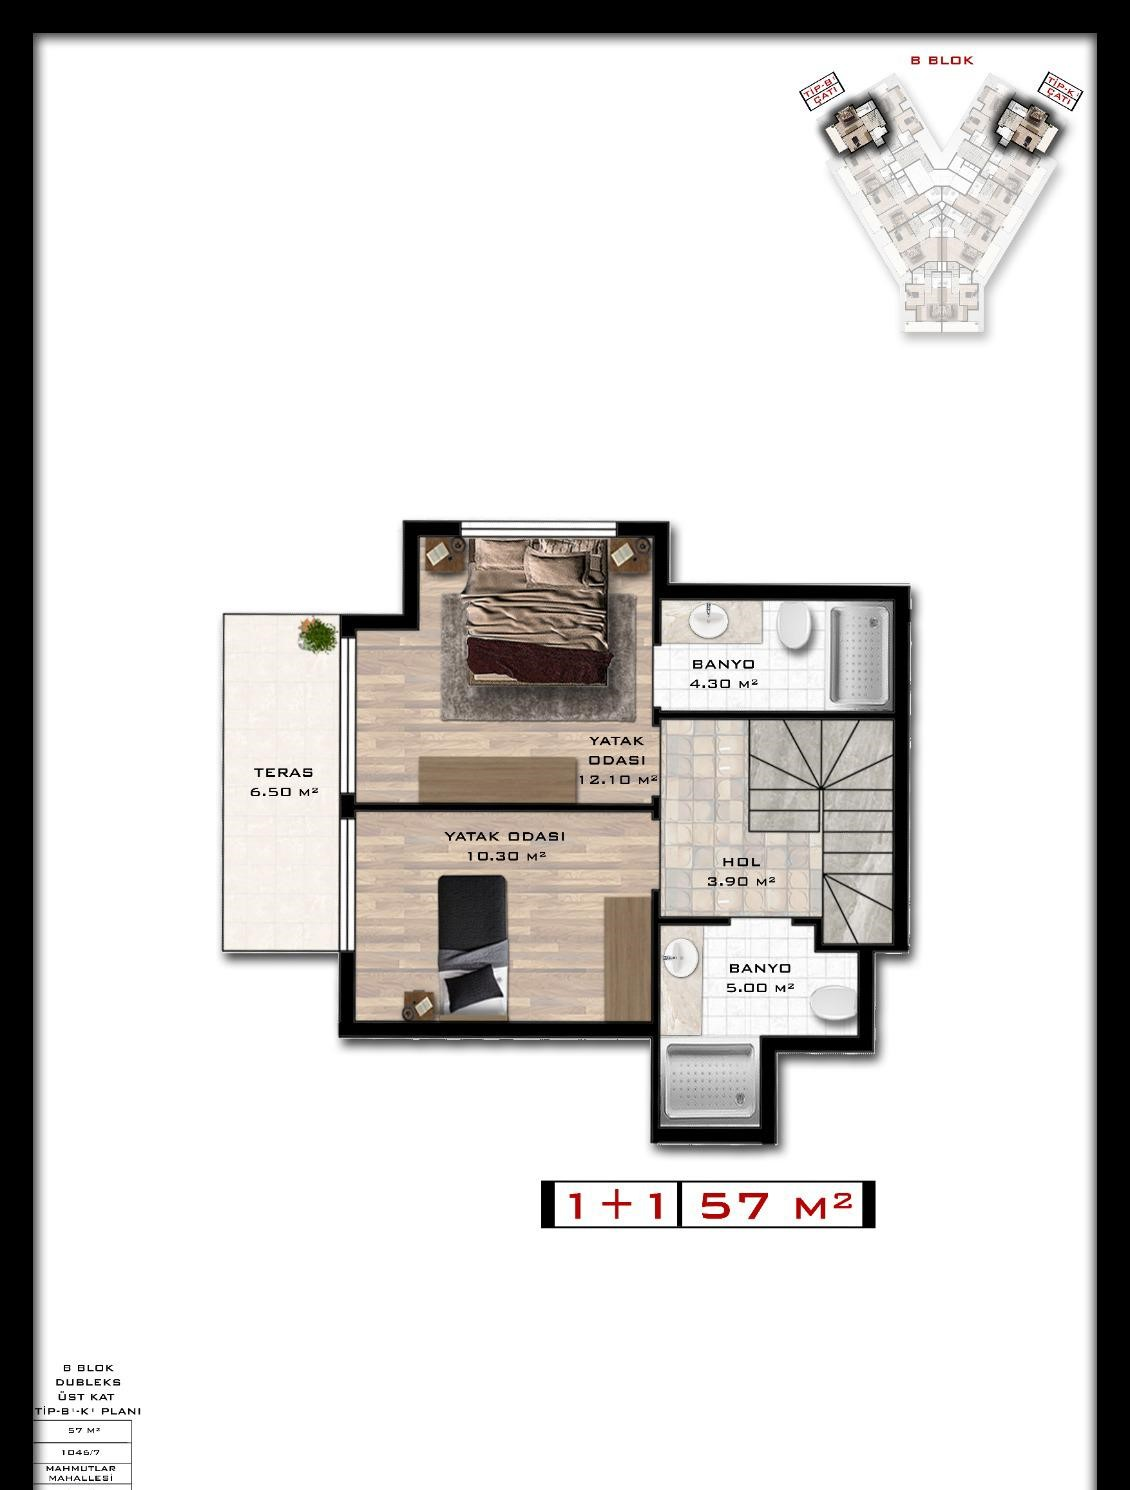 Квартиры и пентхаусы в комплексе с богатой инфраструктурой район Махмутлар - Фото 21